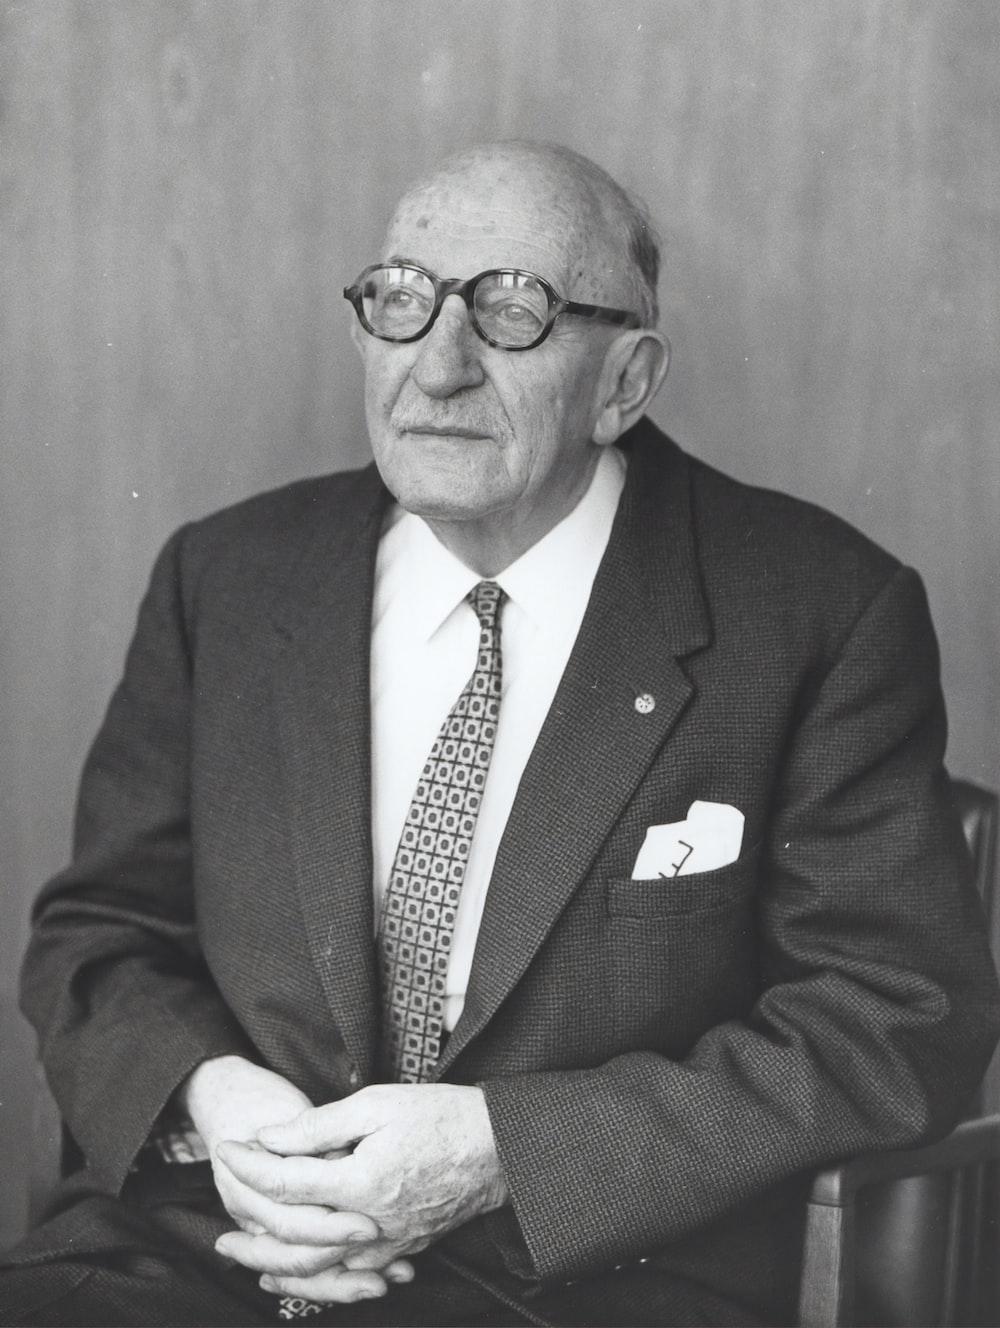 man wearing suit jacket and eyeglasses